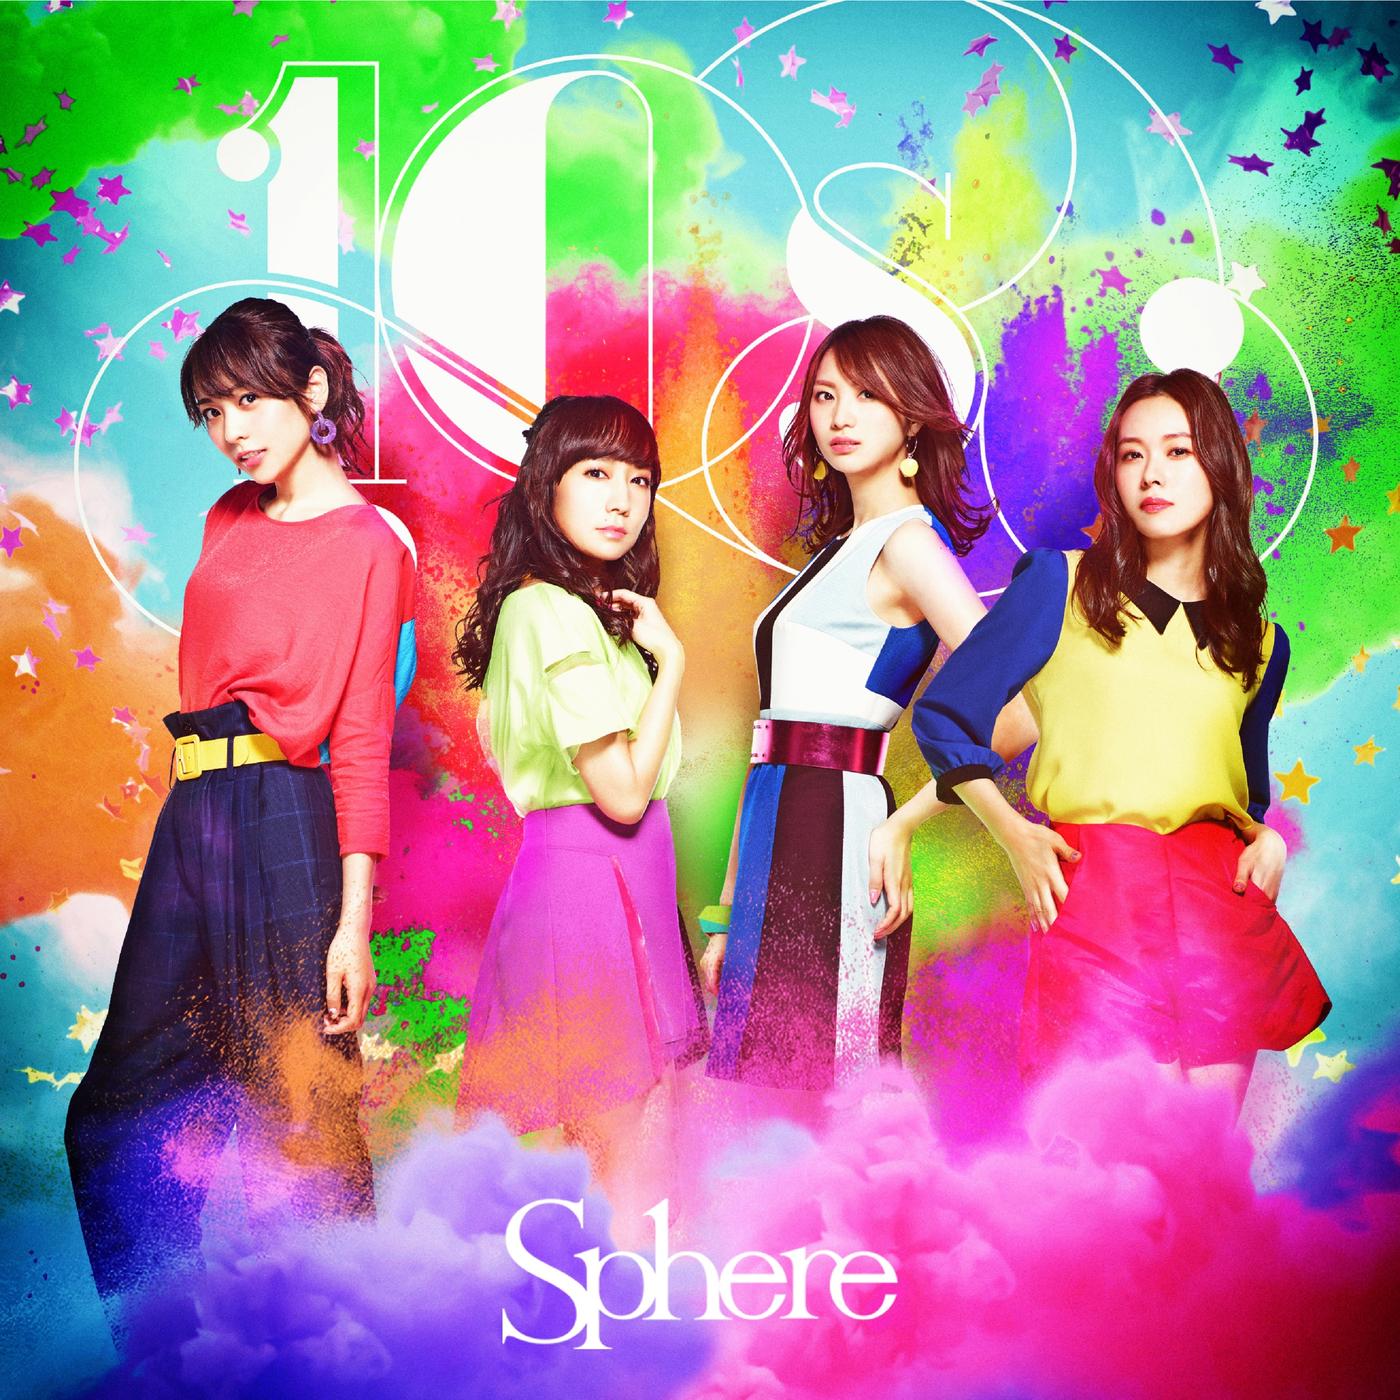 10s - Sphere